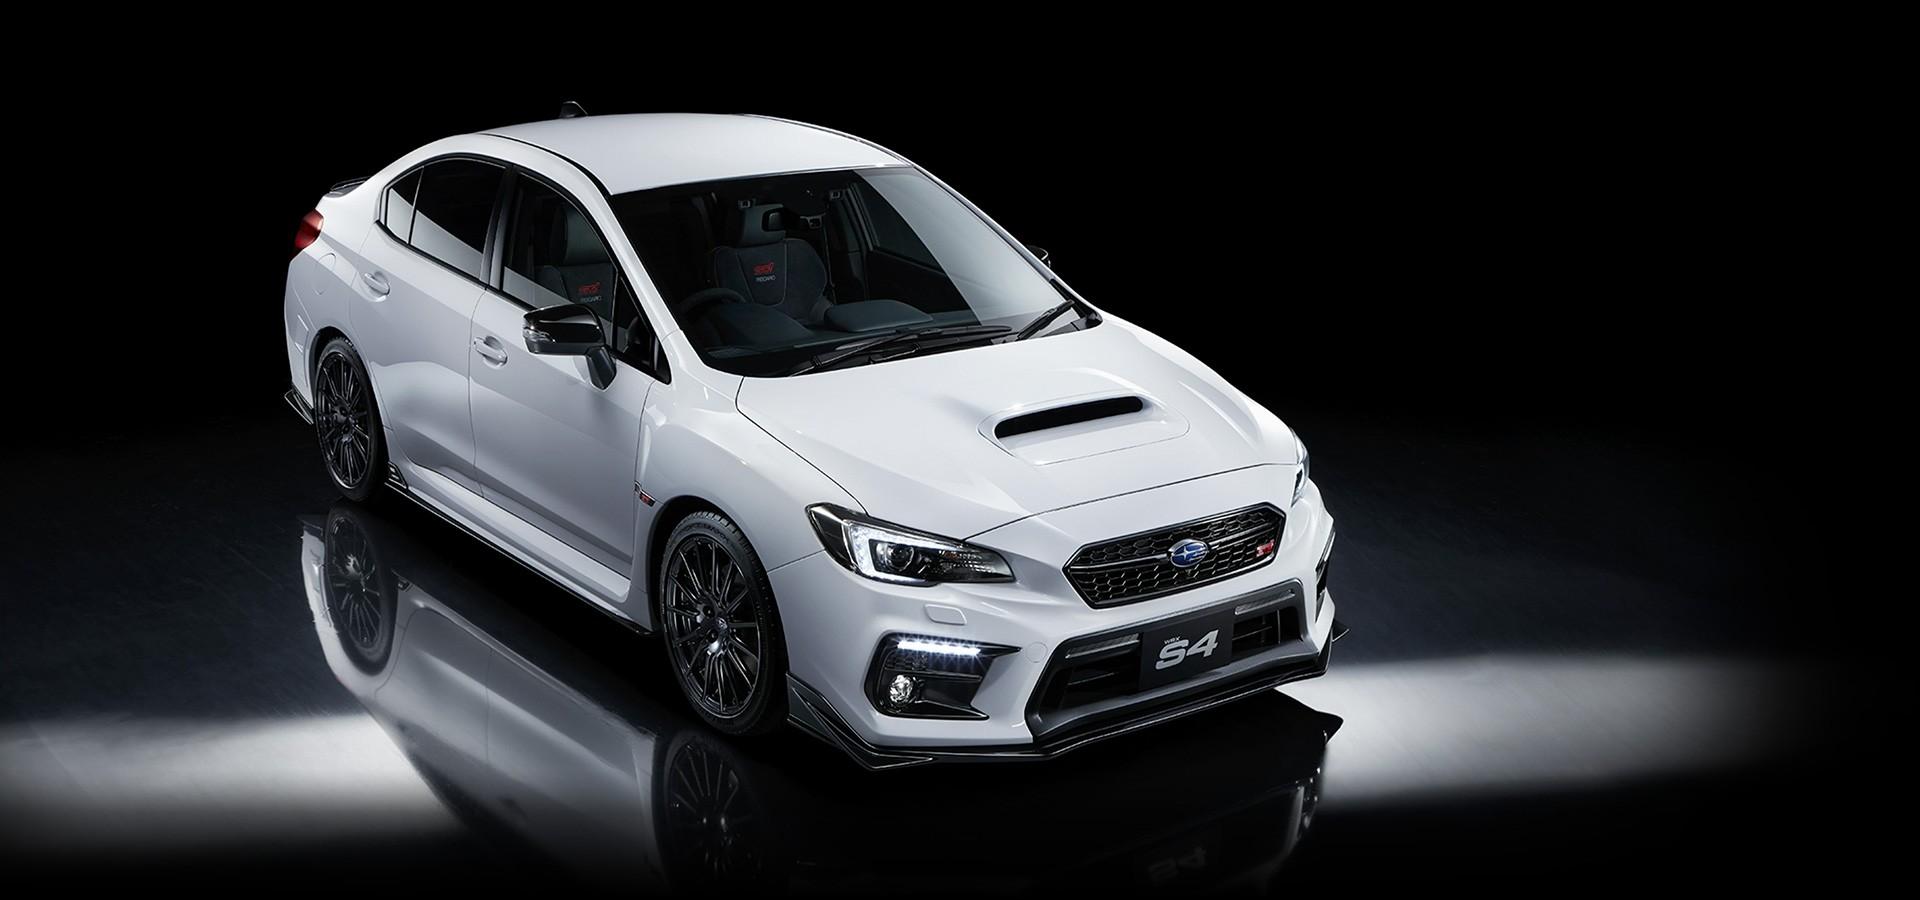 фото Subaru WRX S4 STI Sport EyeSight 2021